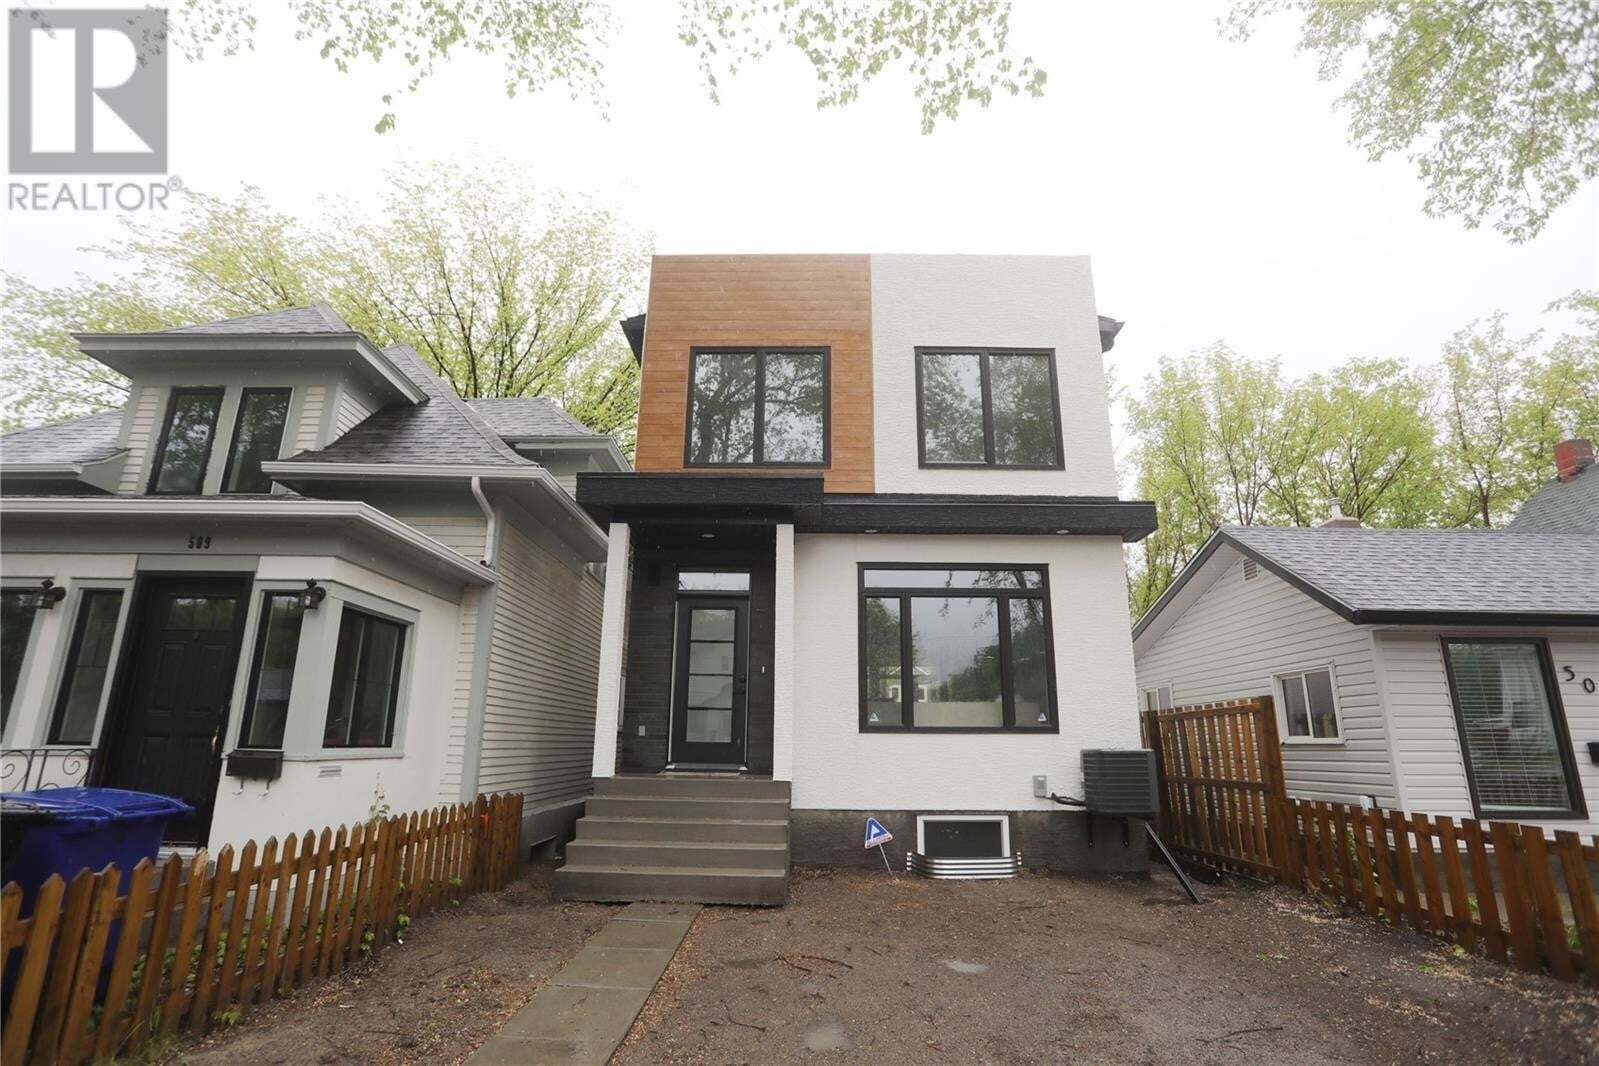 House for sale at 507 F Ave S Saskatoon Saskatchewan - MLS: SK826676